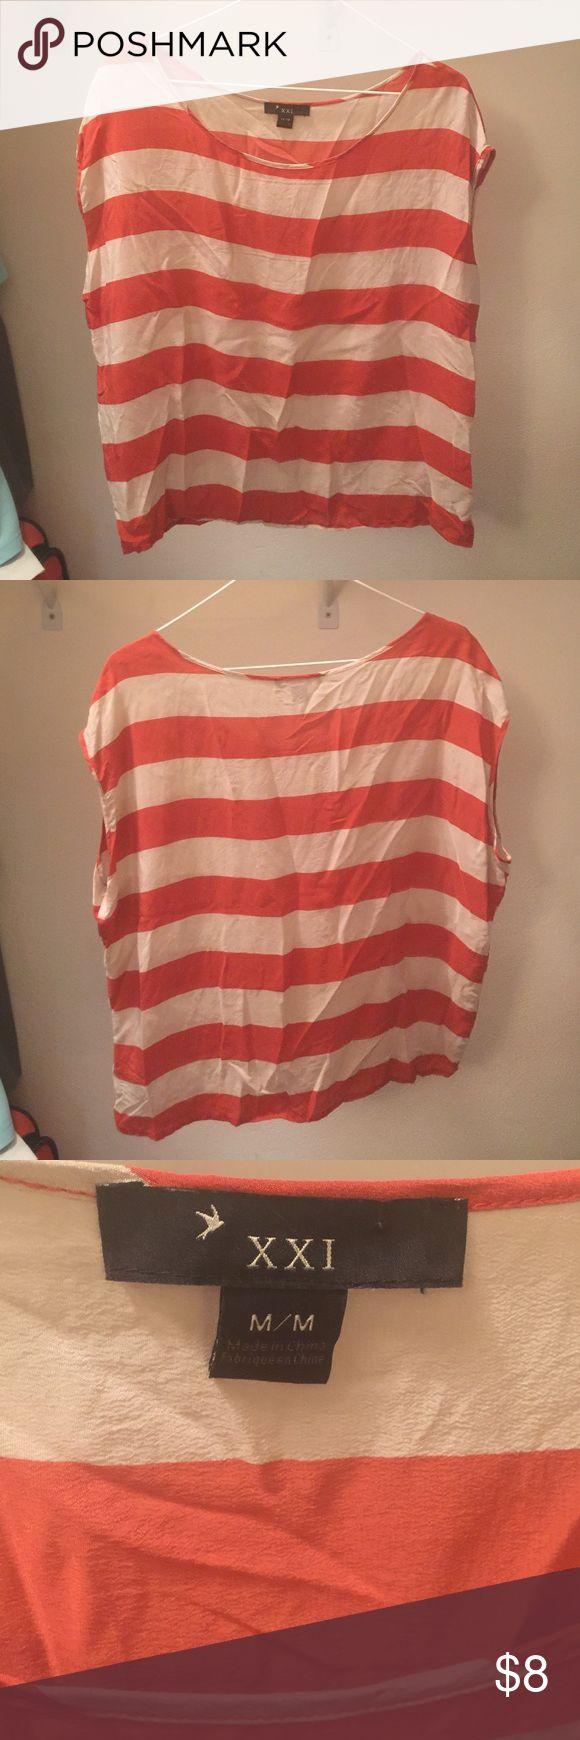 Short sleeved dress shirt Short sleeved dressy shirt. Very light weight! Perfect for fall! xxi Tops Tees - Short Sleeve